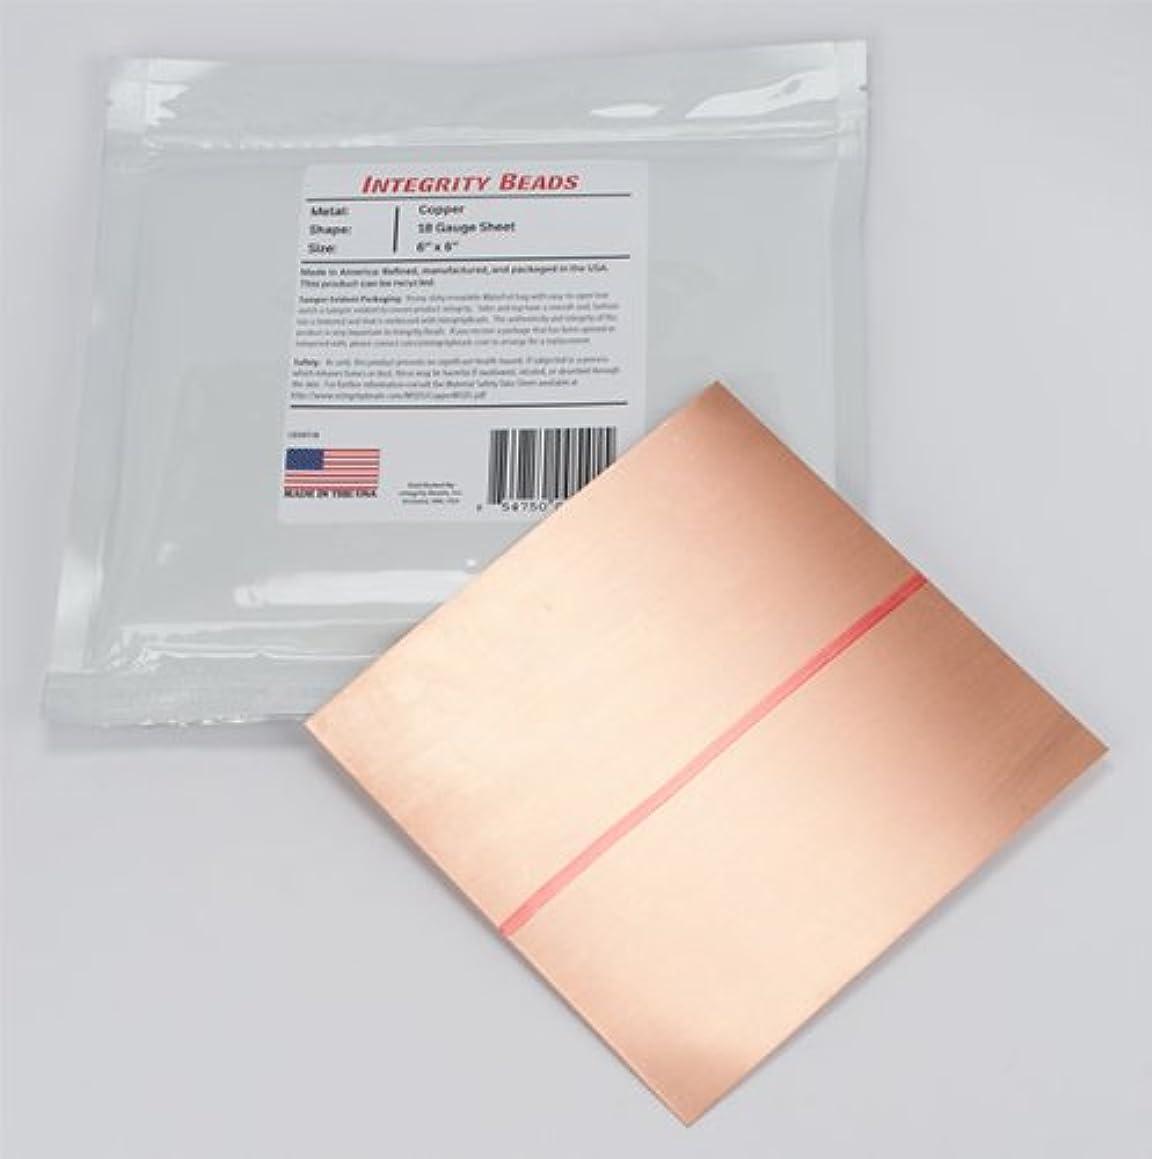 Copper 18 Gauge Sheet - 6